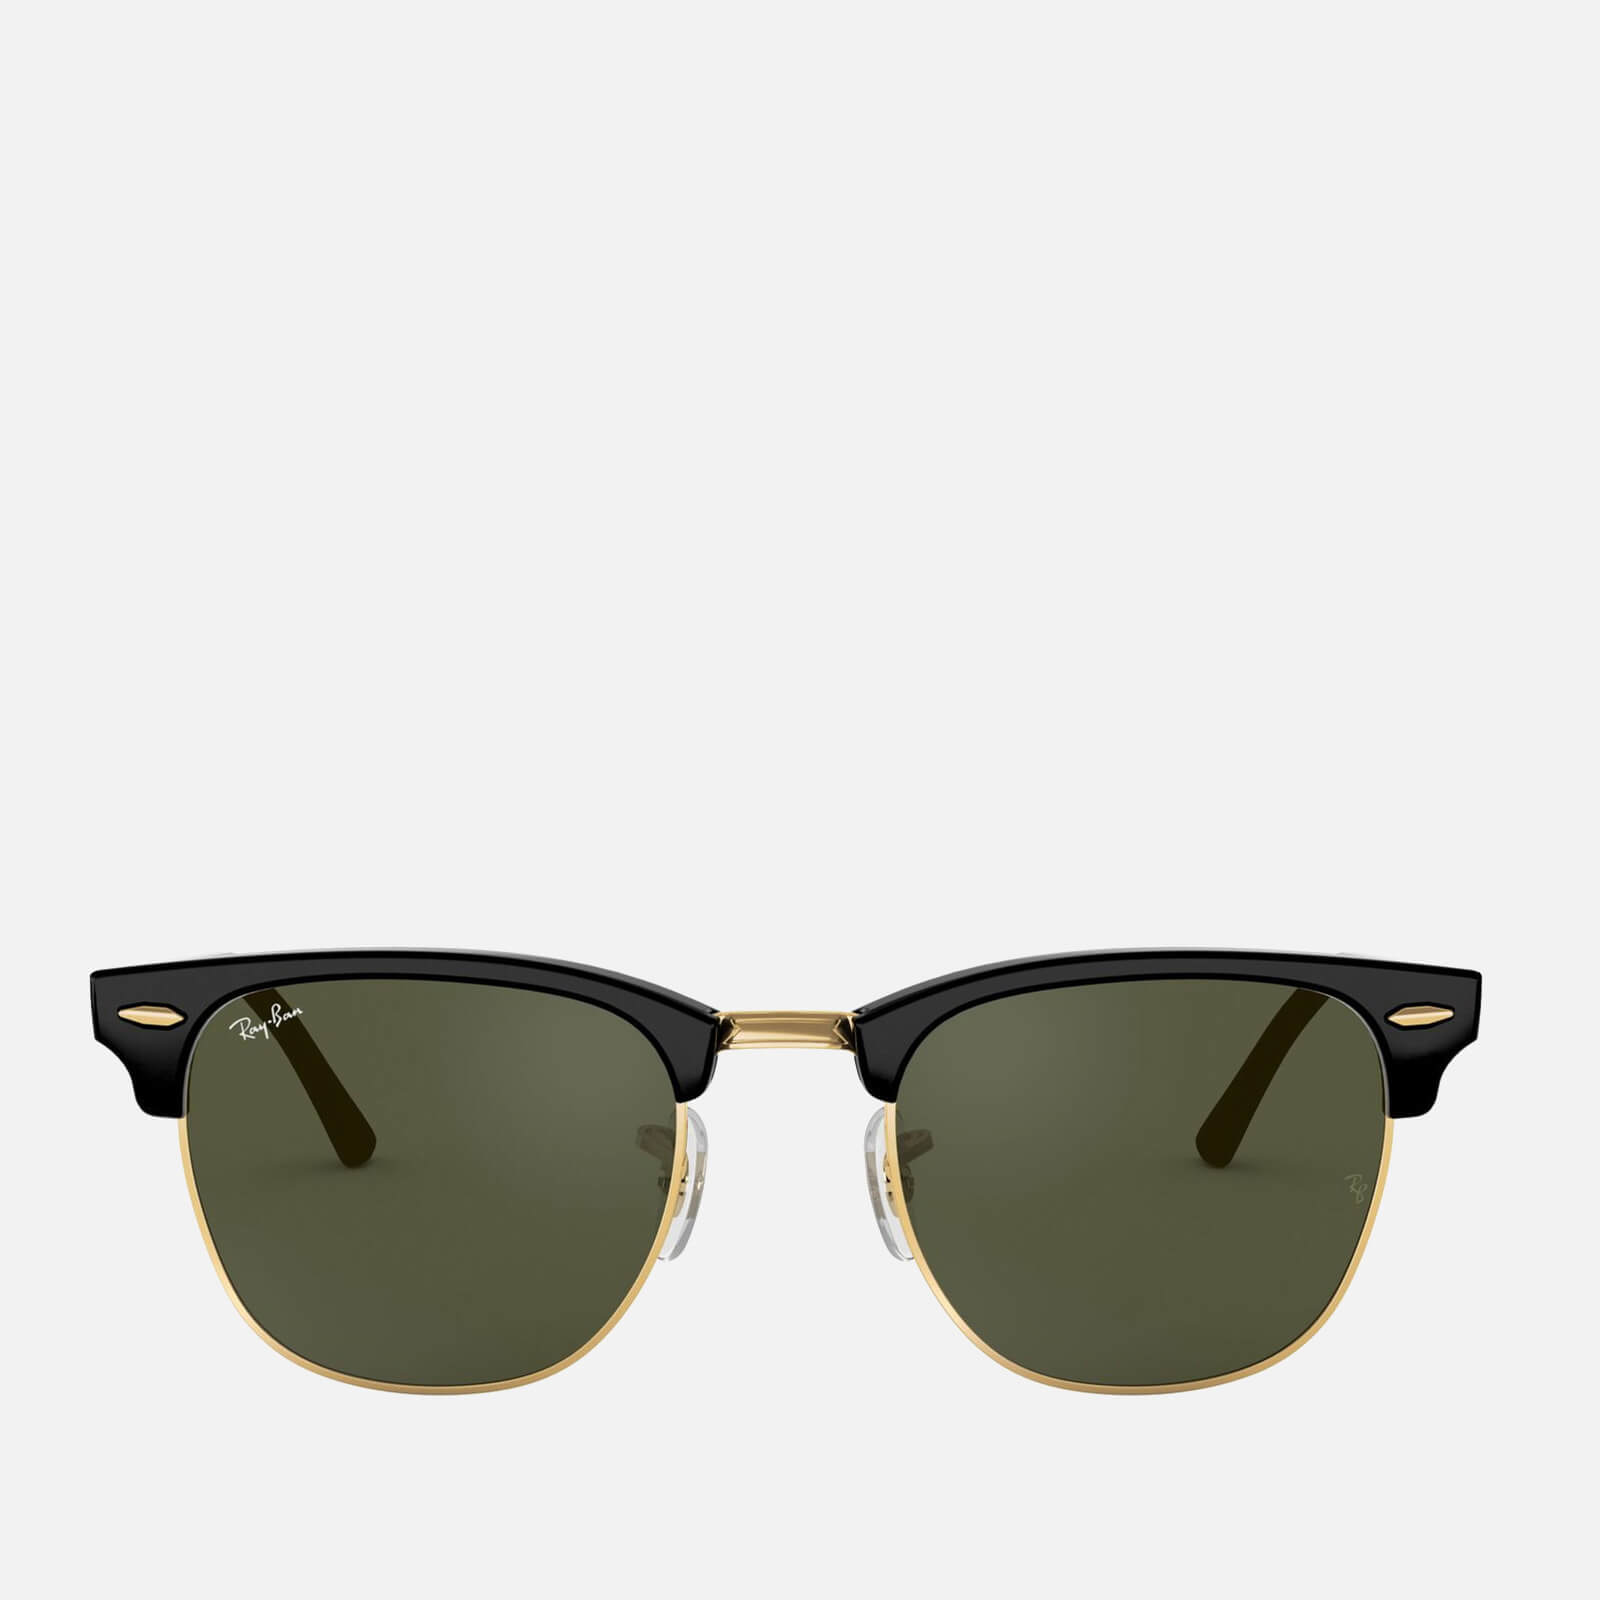 Ray-Ban Women's Clubmaster Sunglasses - Black